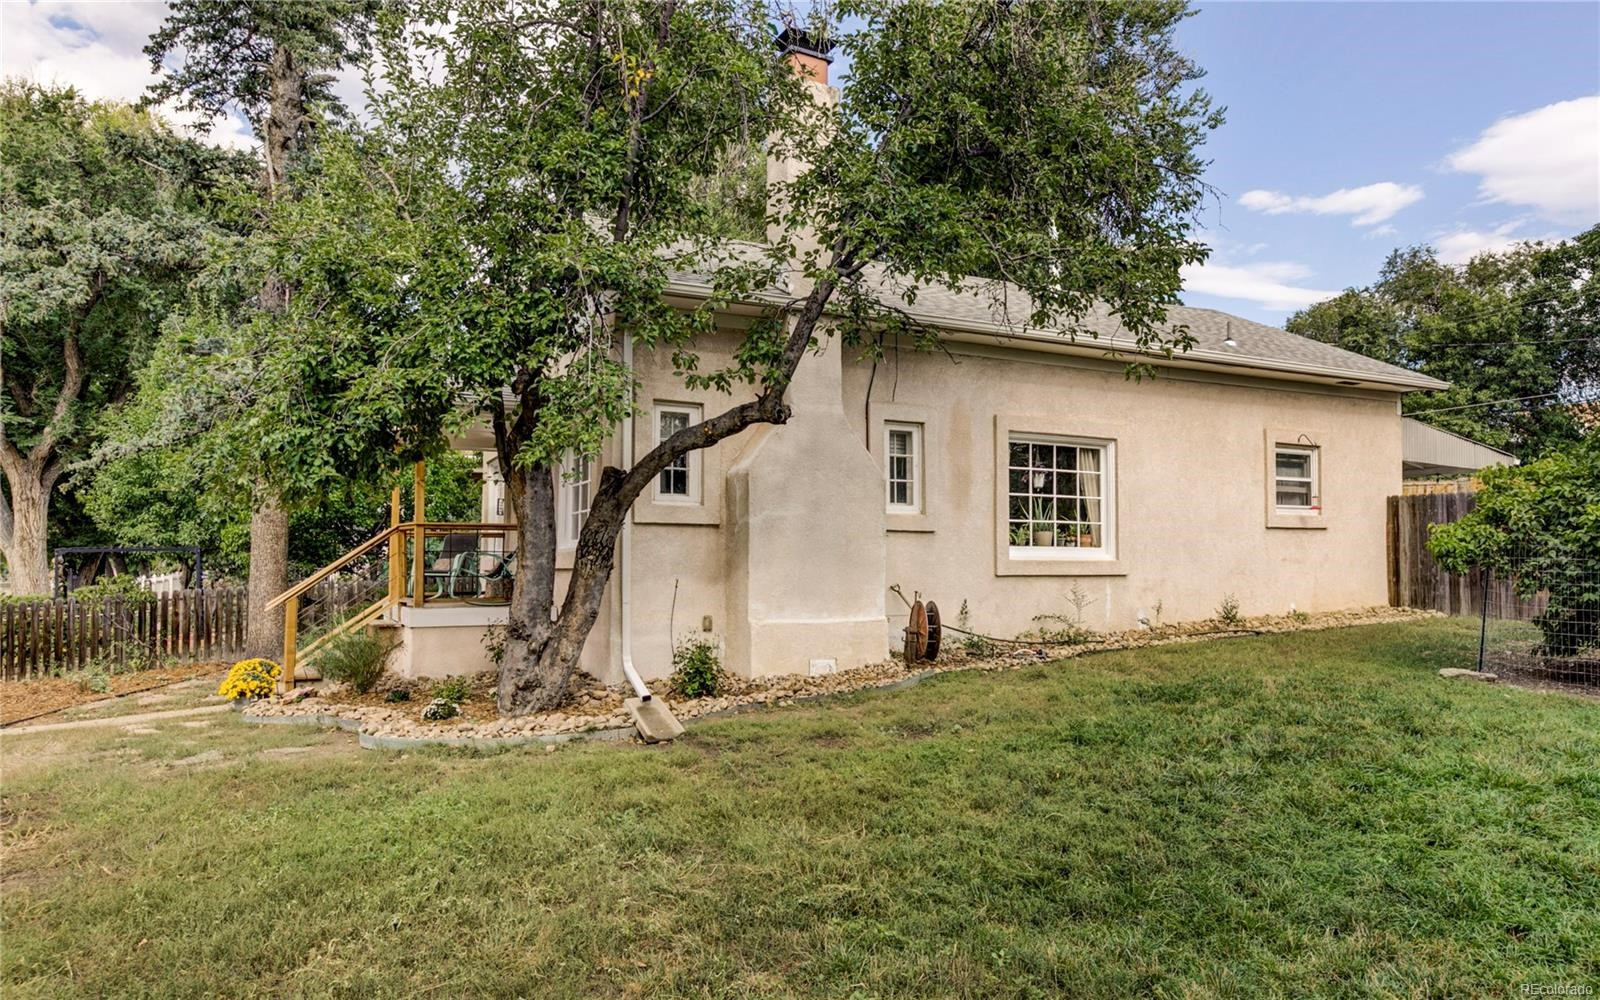 MLS# 3493456 - 3 - 2018 Armstrong Avenue, Colorado Springs, CO 80904